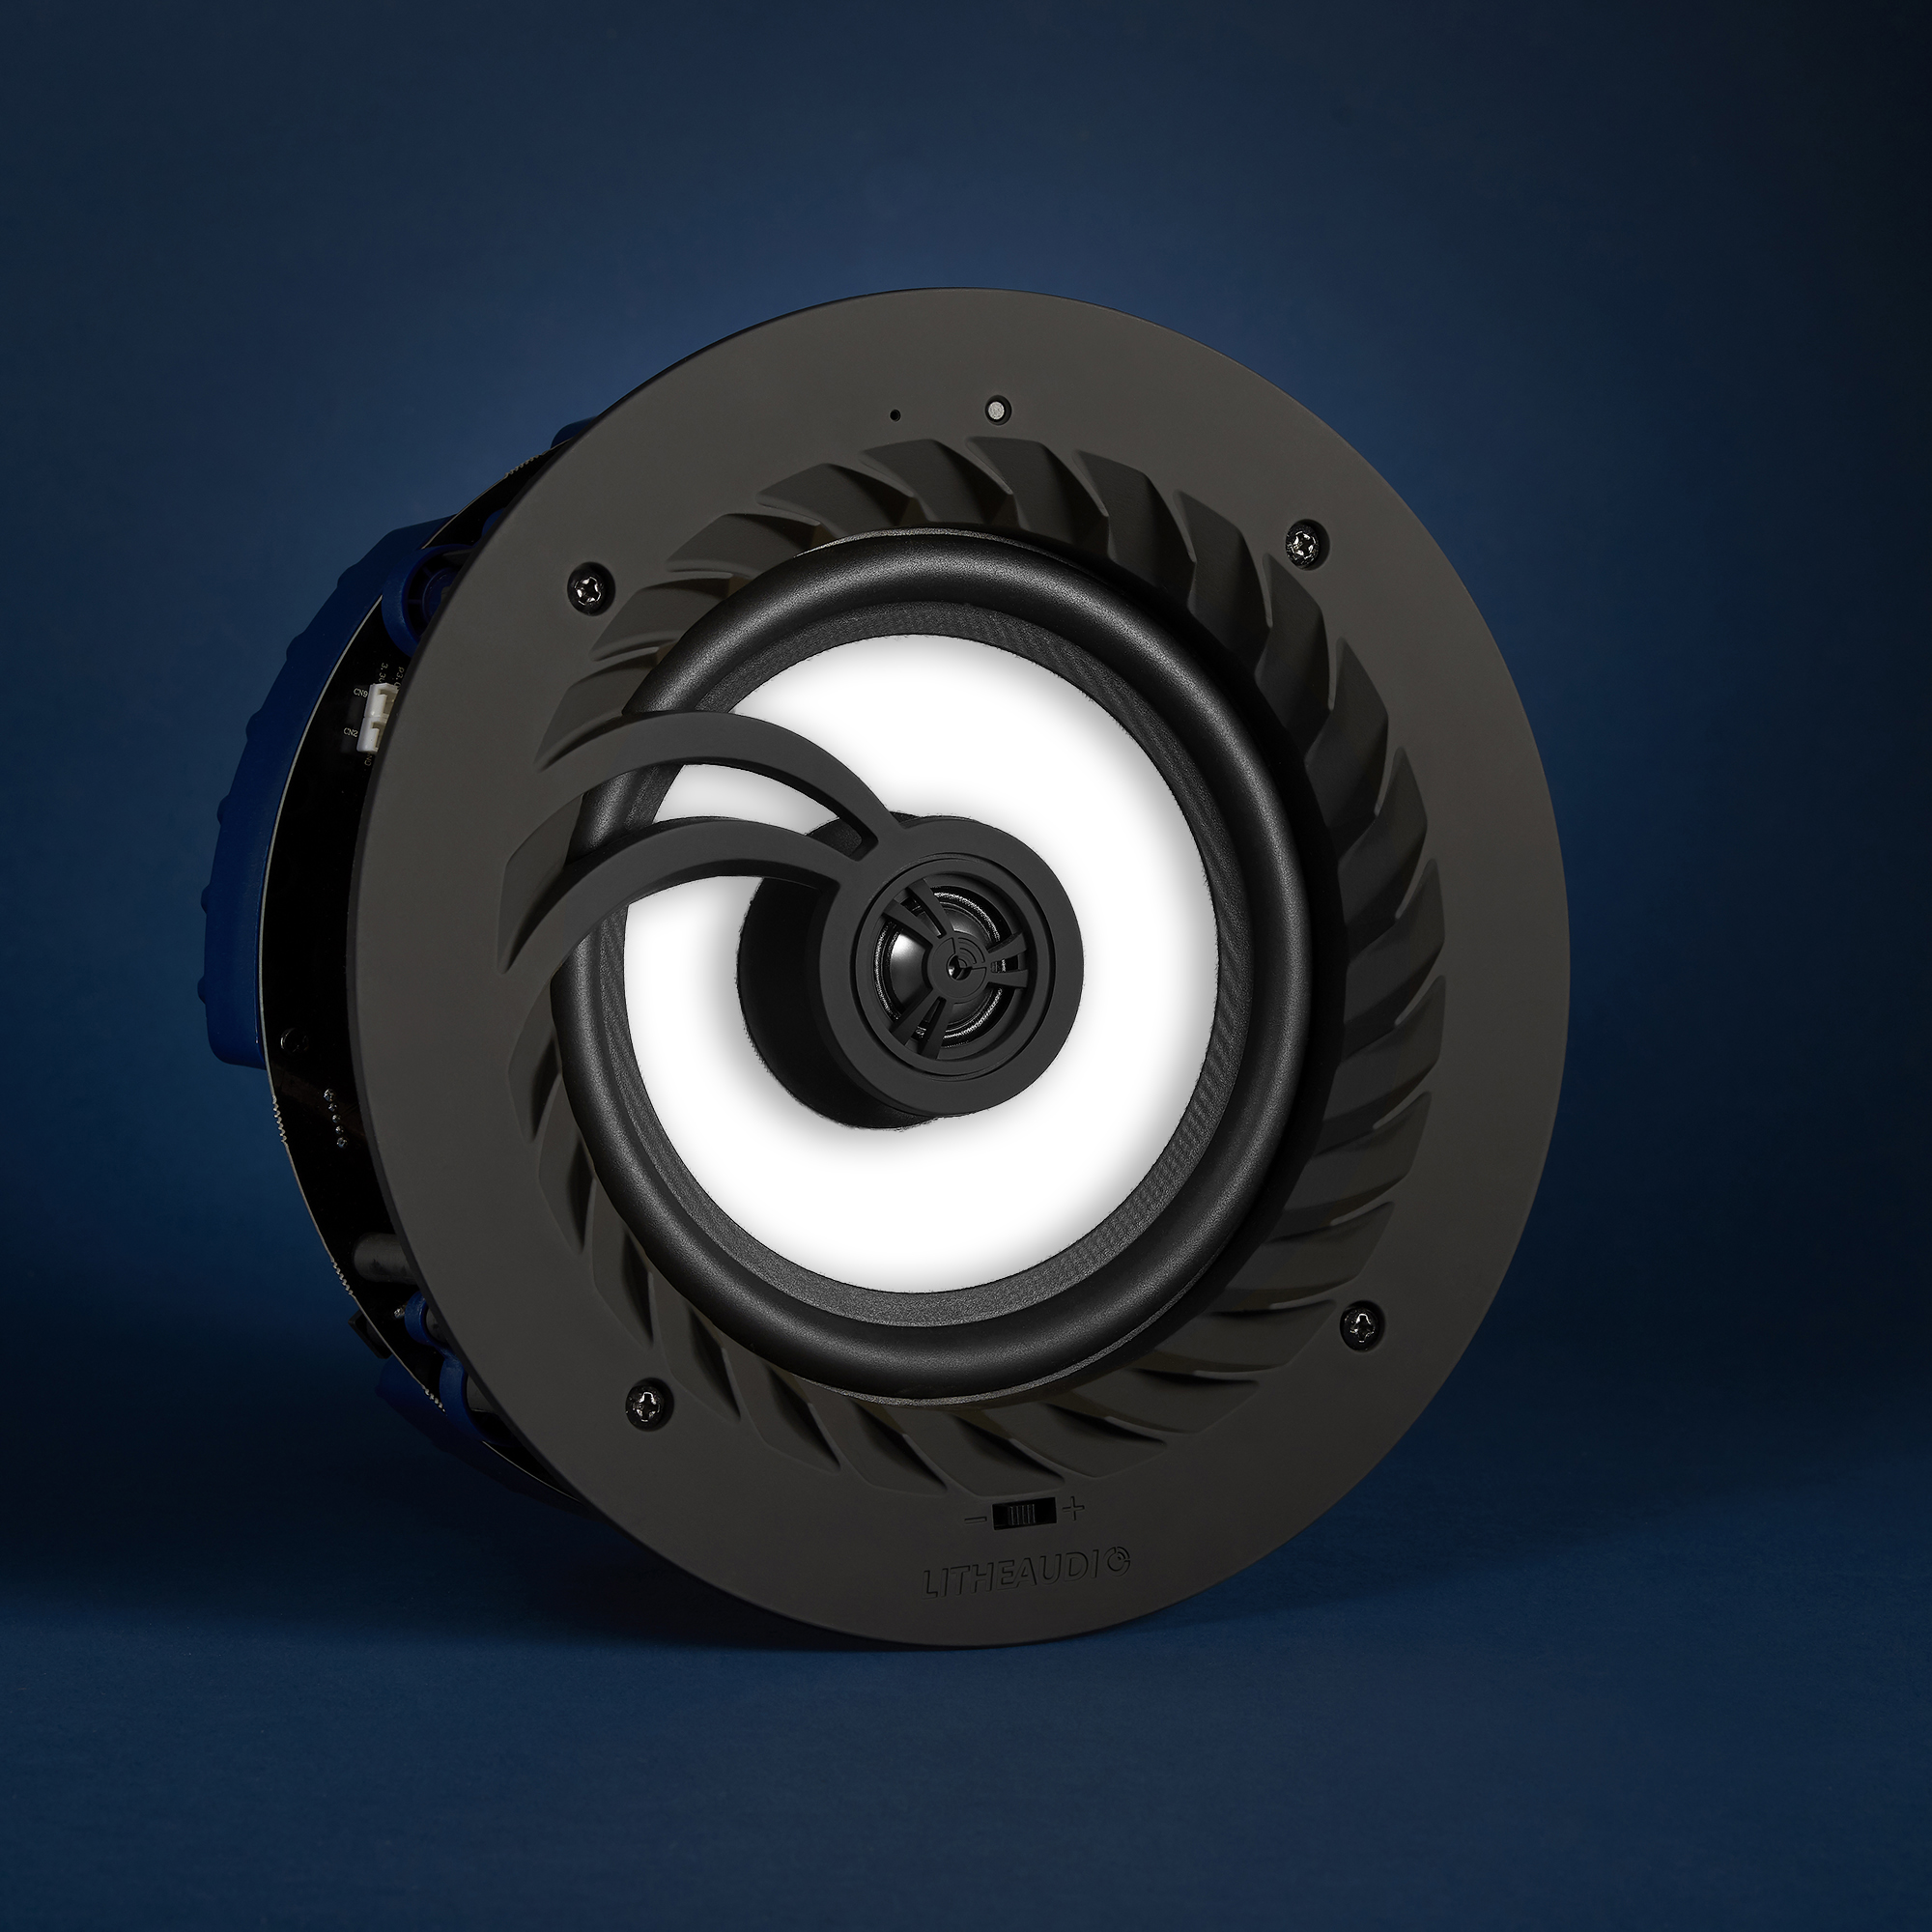 Lithe Audio IP44 Bluetooth PP Speaker Enceinte Encastrable Bluetooth